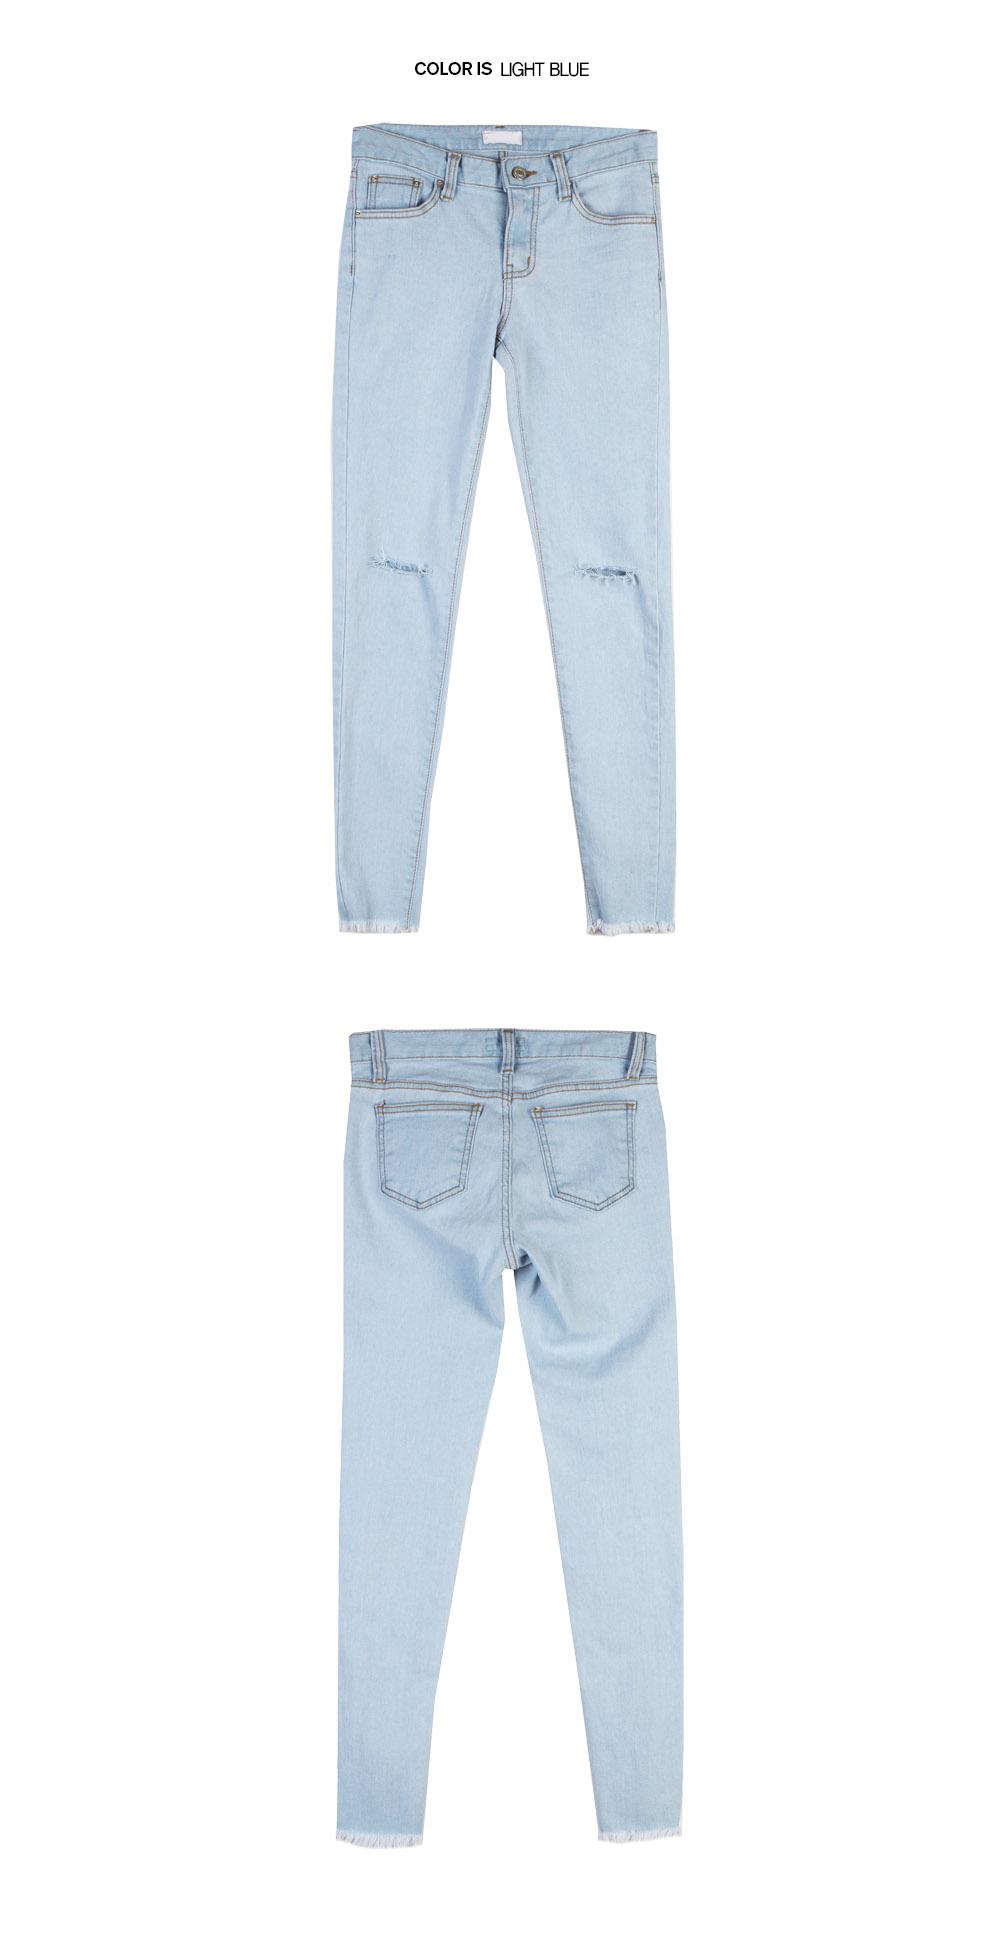 Vintage Blue Knee-Slit Skinny Jeans